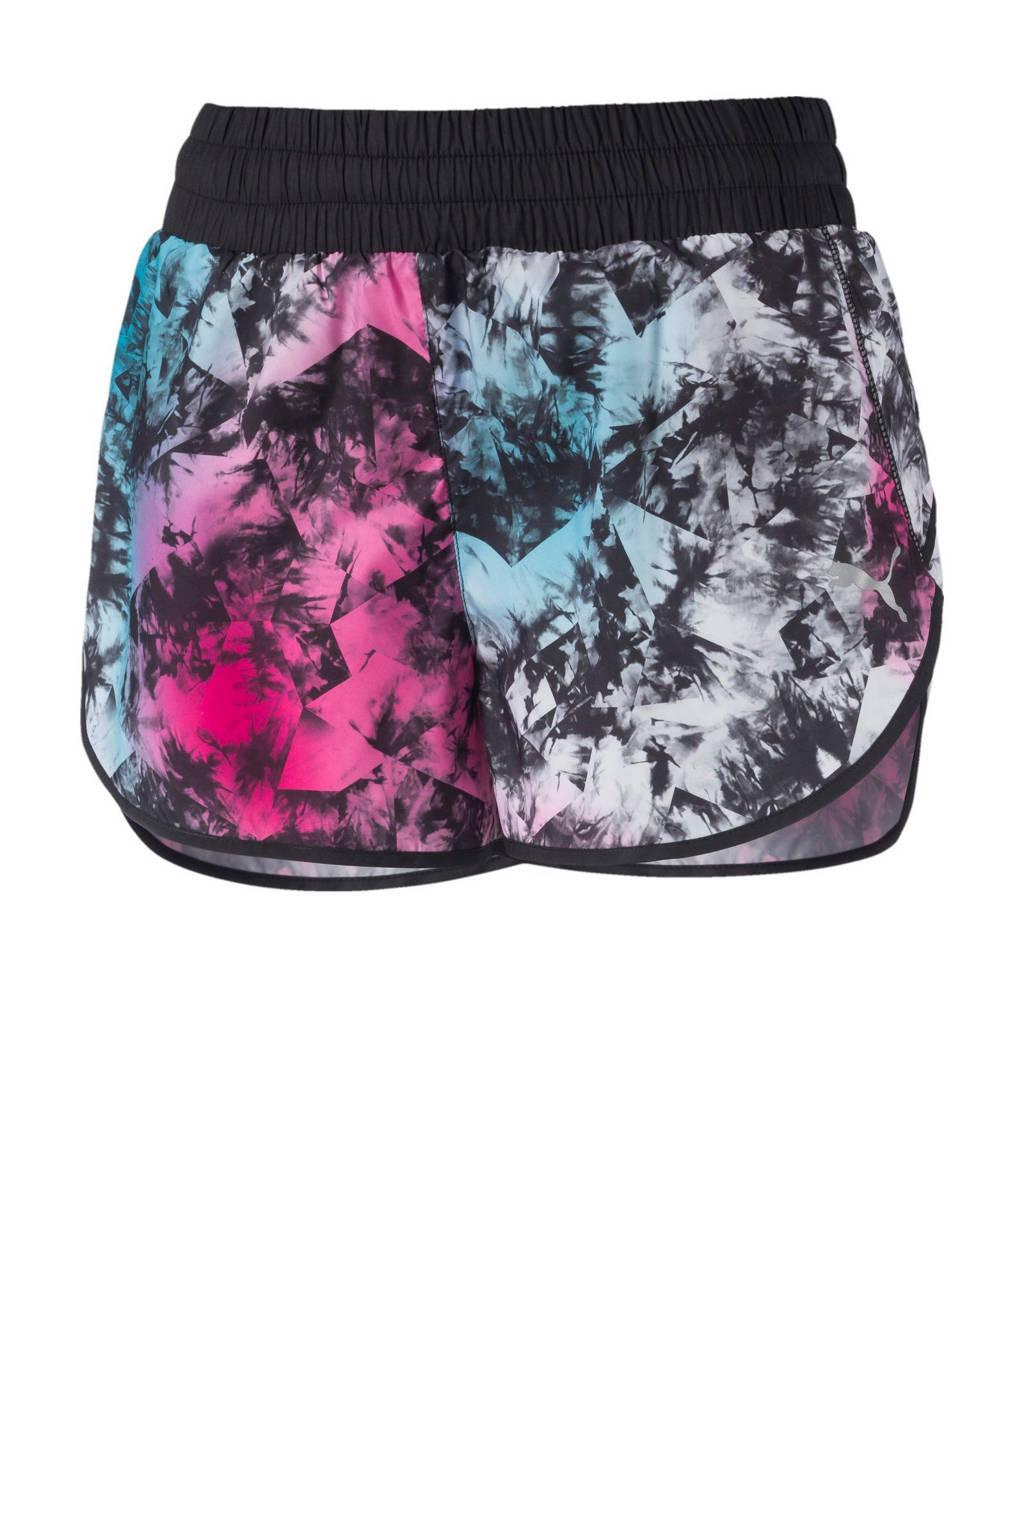 Puma sportshort met all over print roze/blauw/zwart, Roze/blauw/zwart